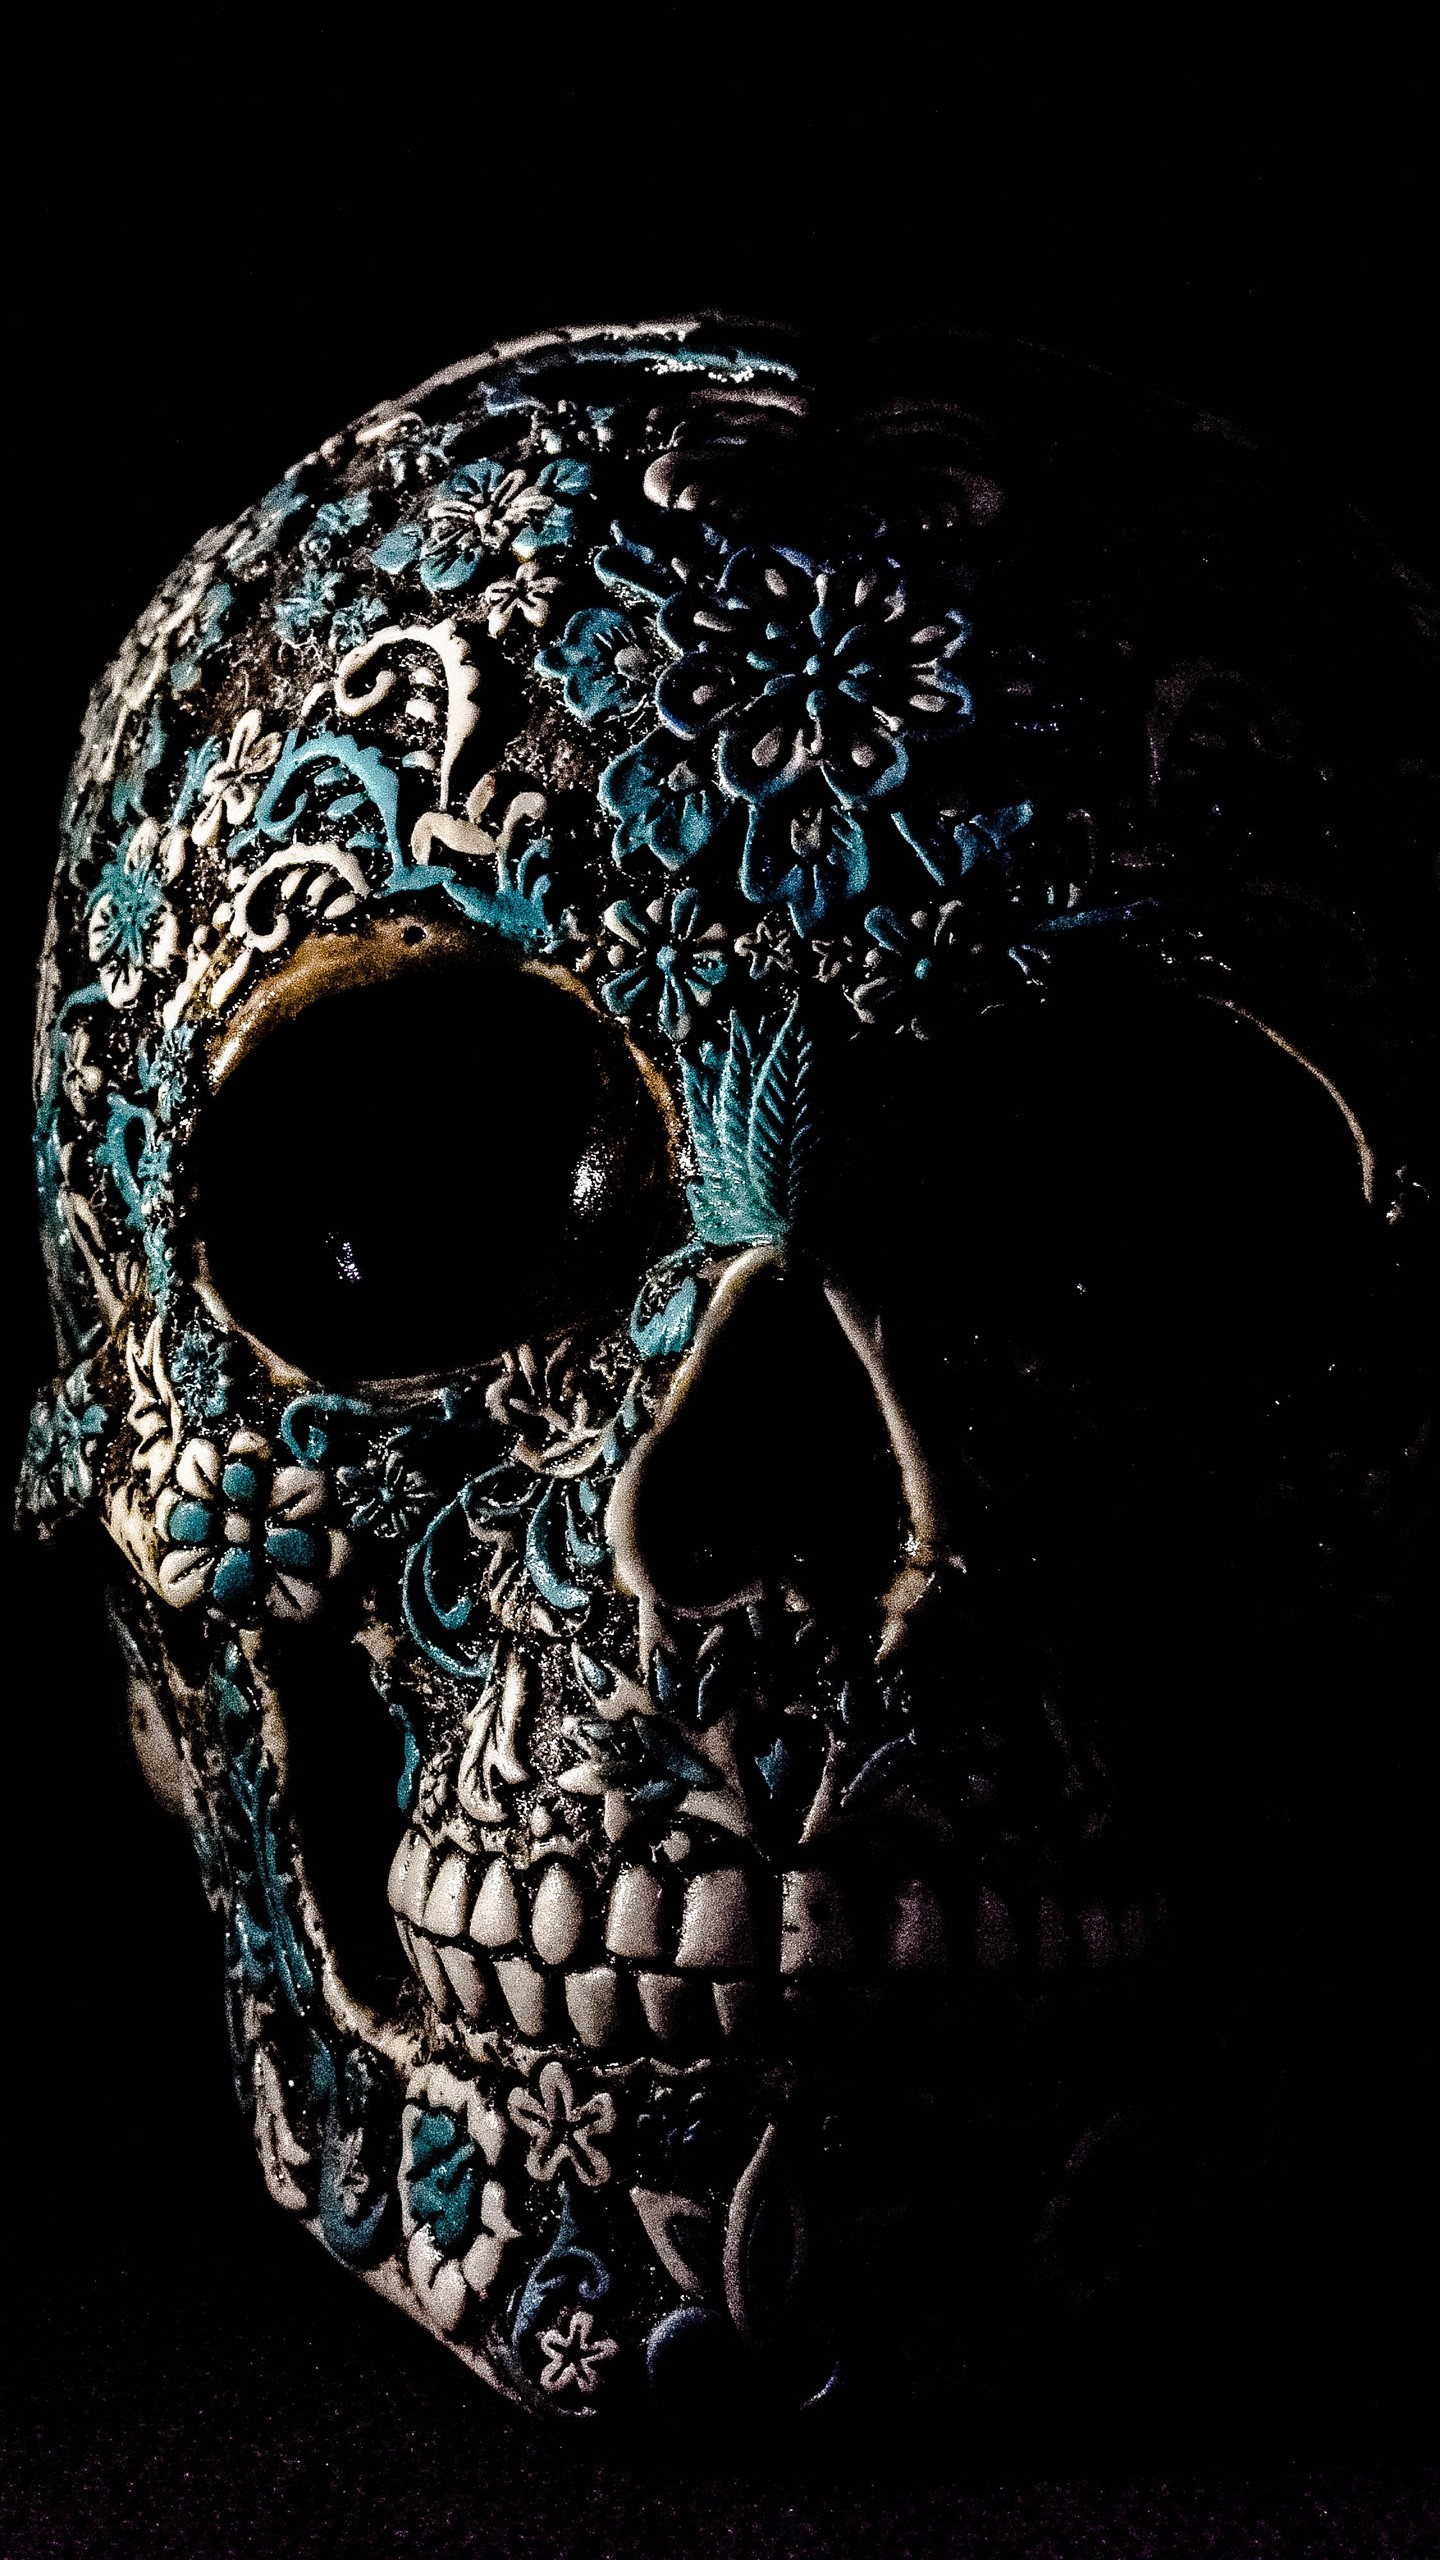 Skull Wallpapers for Laptops (72+ images)